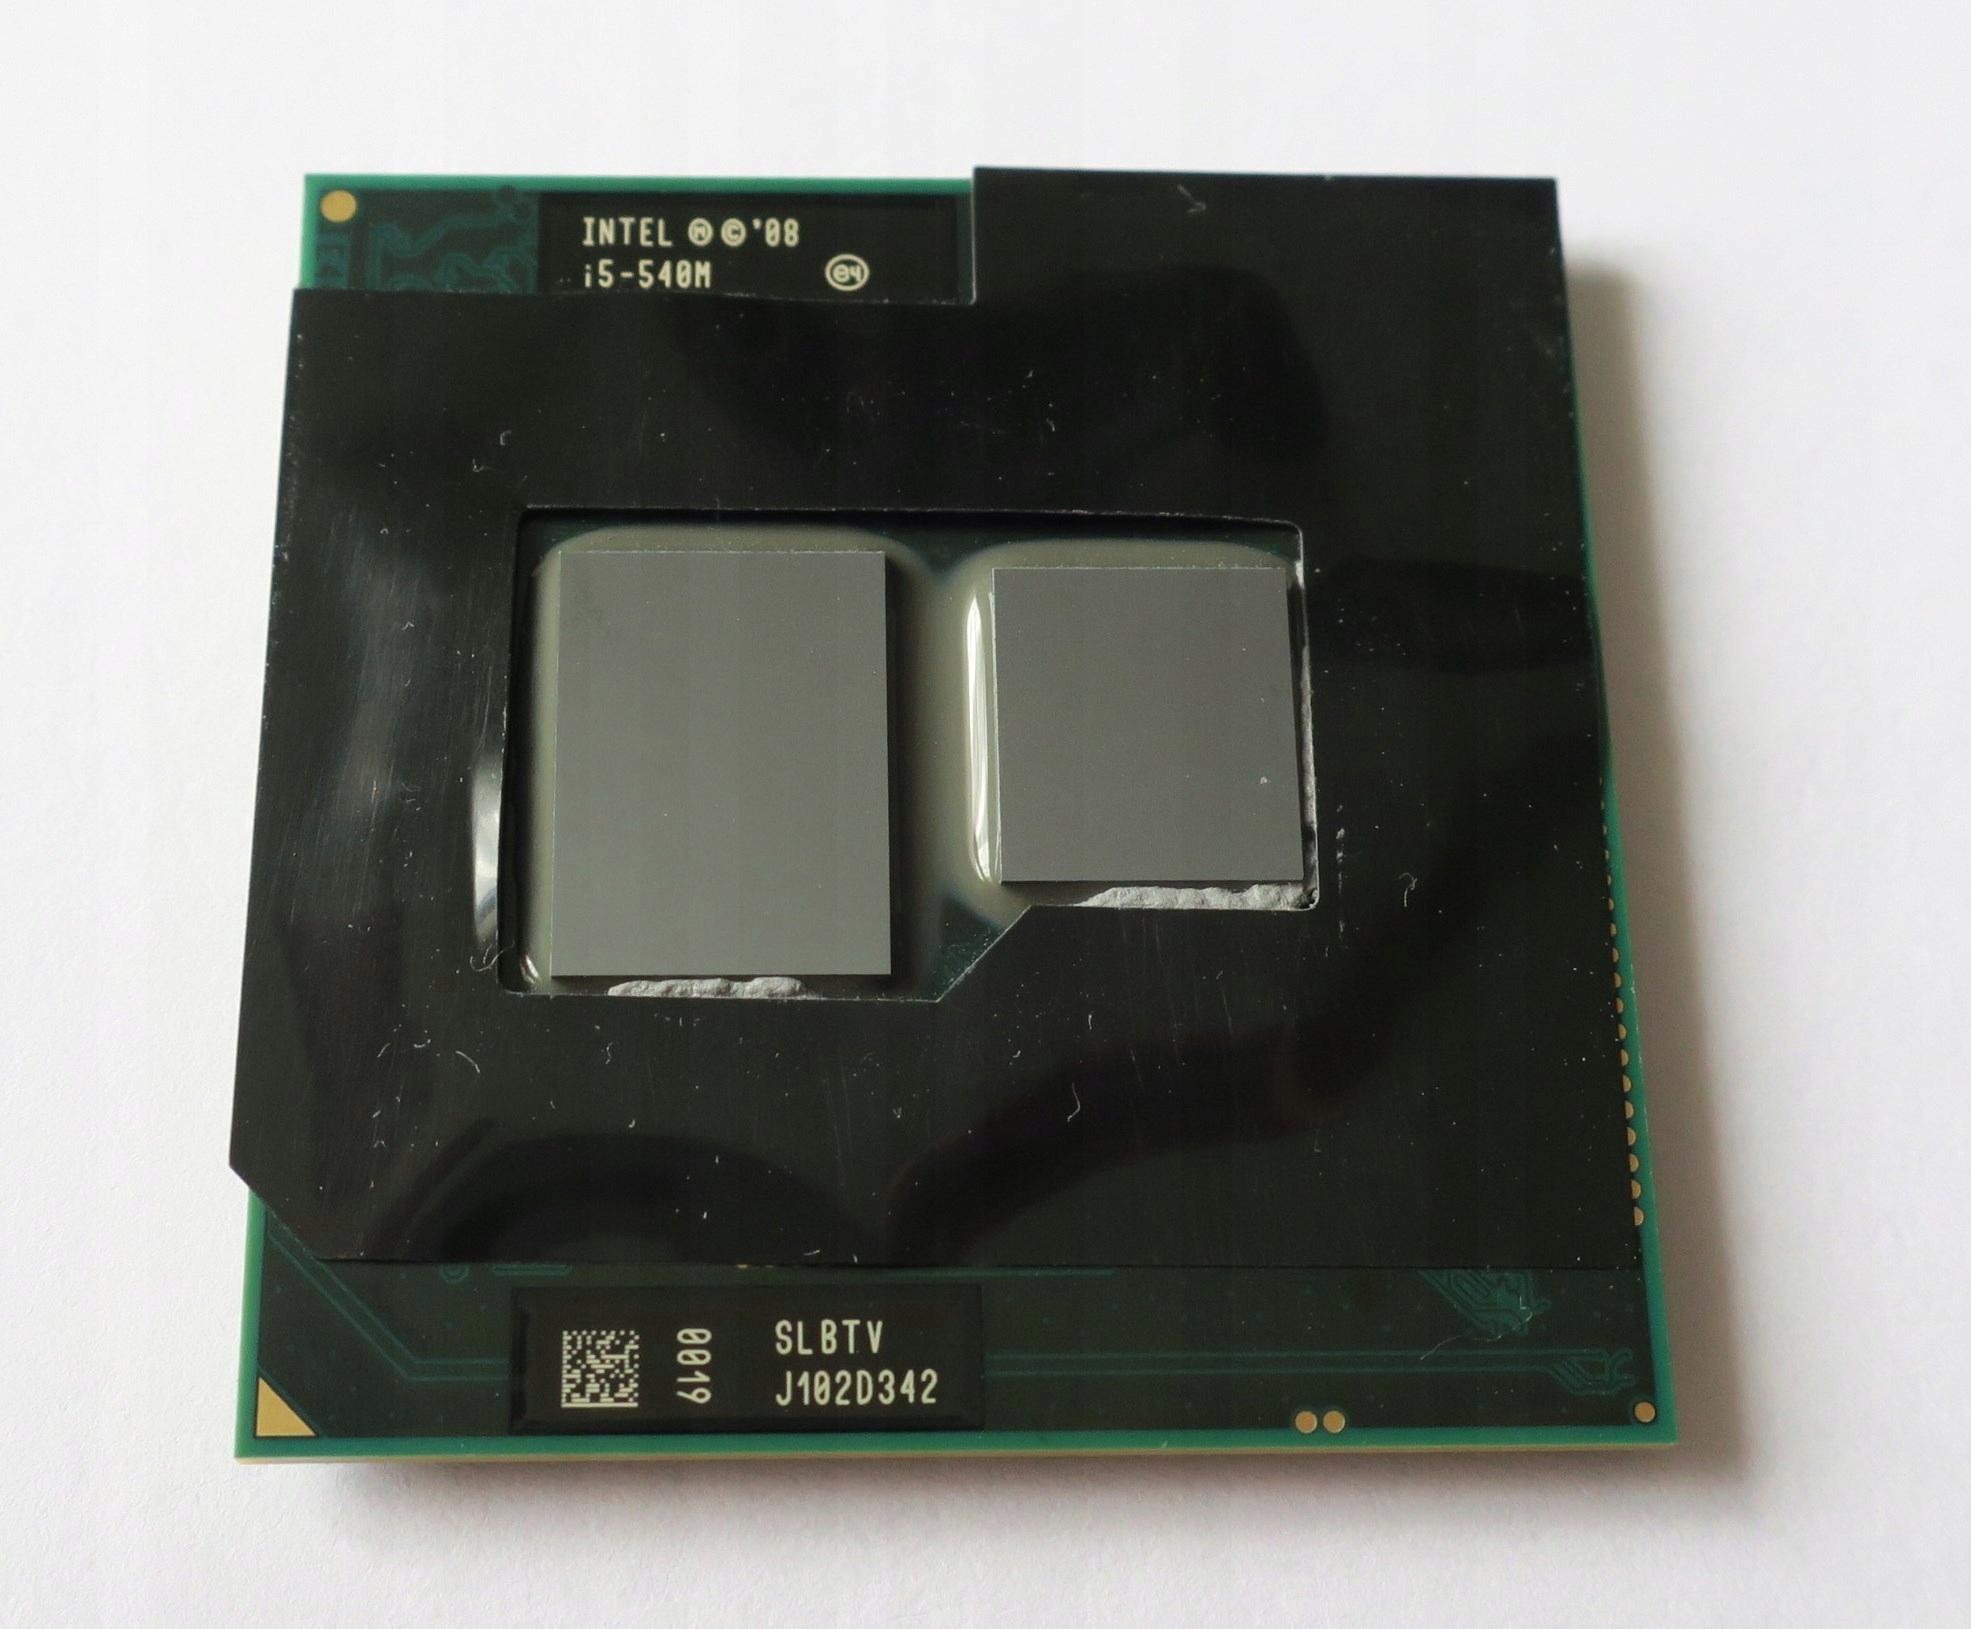 Procesor Intel Core i5 540M 2x2.53 GHz SLBTV